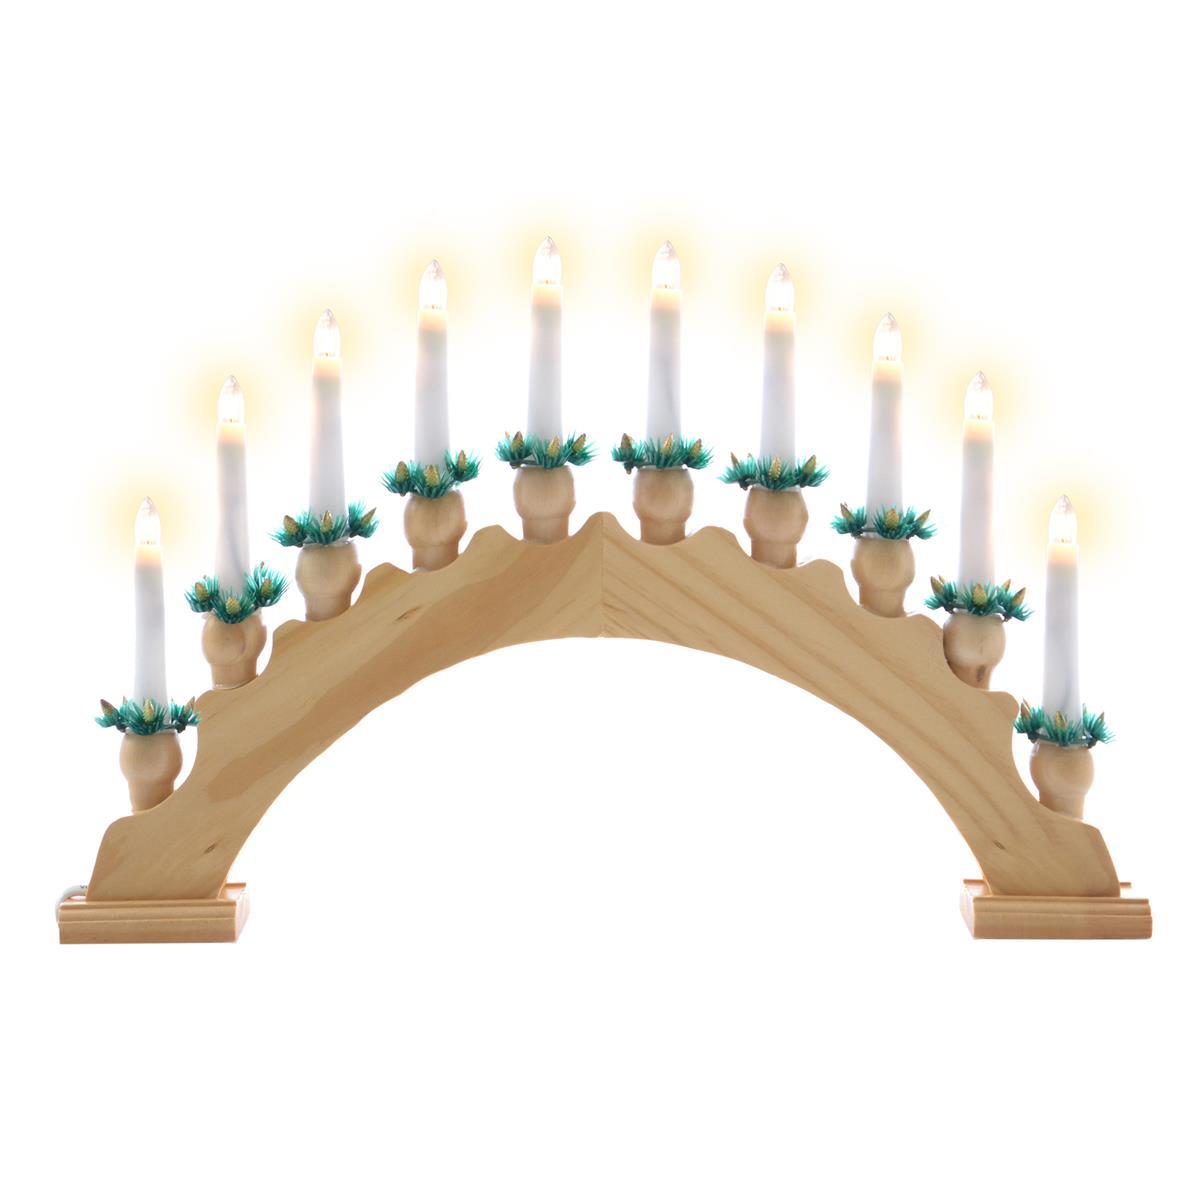 Led Weihnachtsbeleuchtung Warmweiss.Schwibbogen Lichterbogen 10 Led Lichter Weihnachtsbeleuchtung